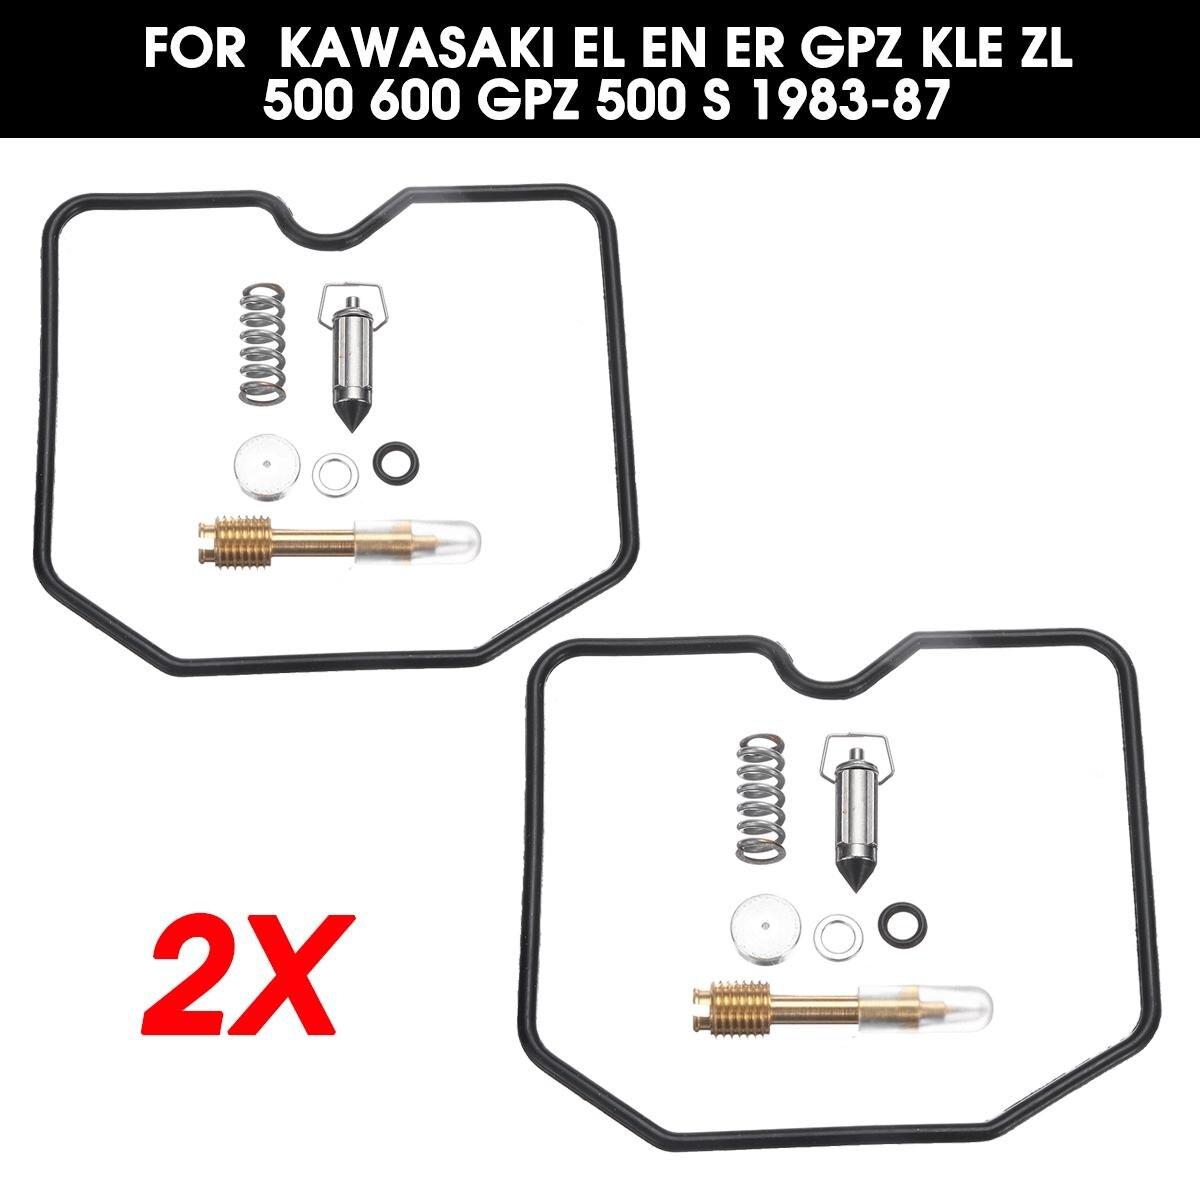 Autoleader 2x Motorcycle Carburetor Rebuild Kits Repair Change Tools For Kawasaki EL EN ER GPZ KLE ZL 500 600 GPZ 500 S 1983-87